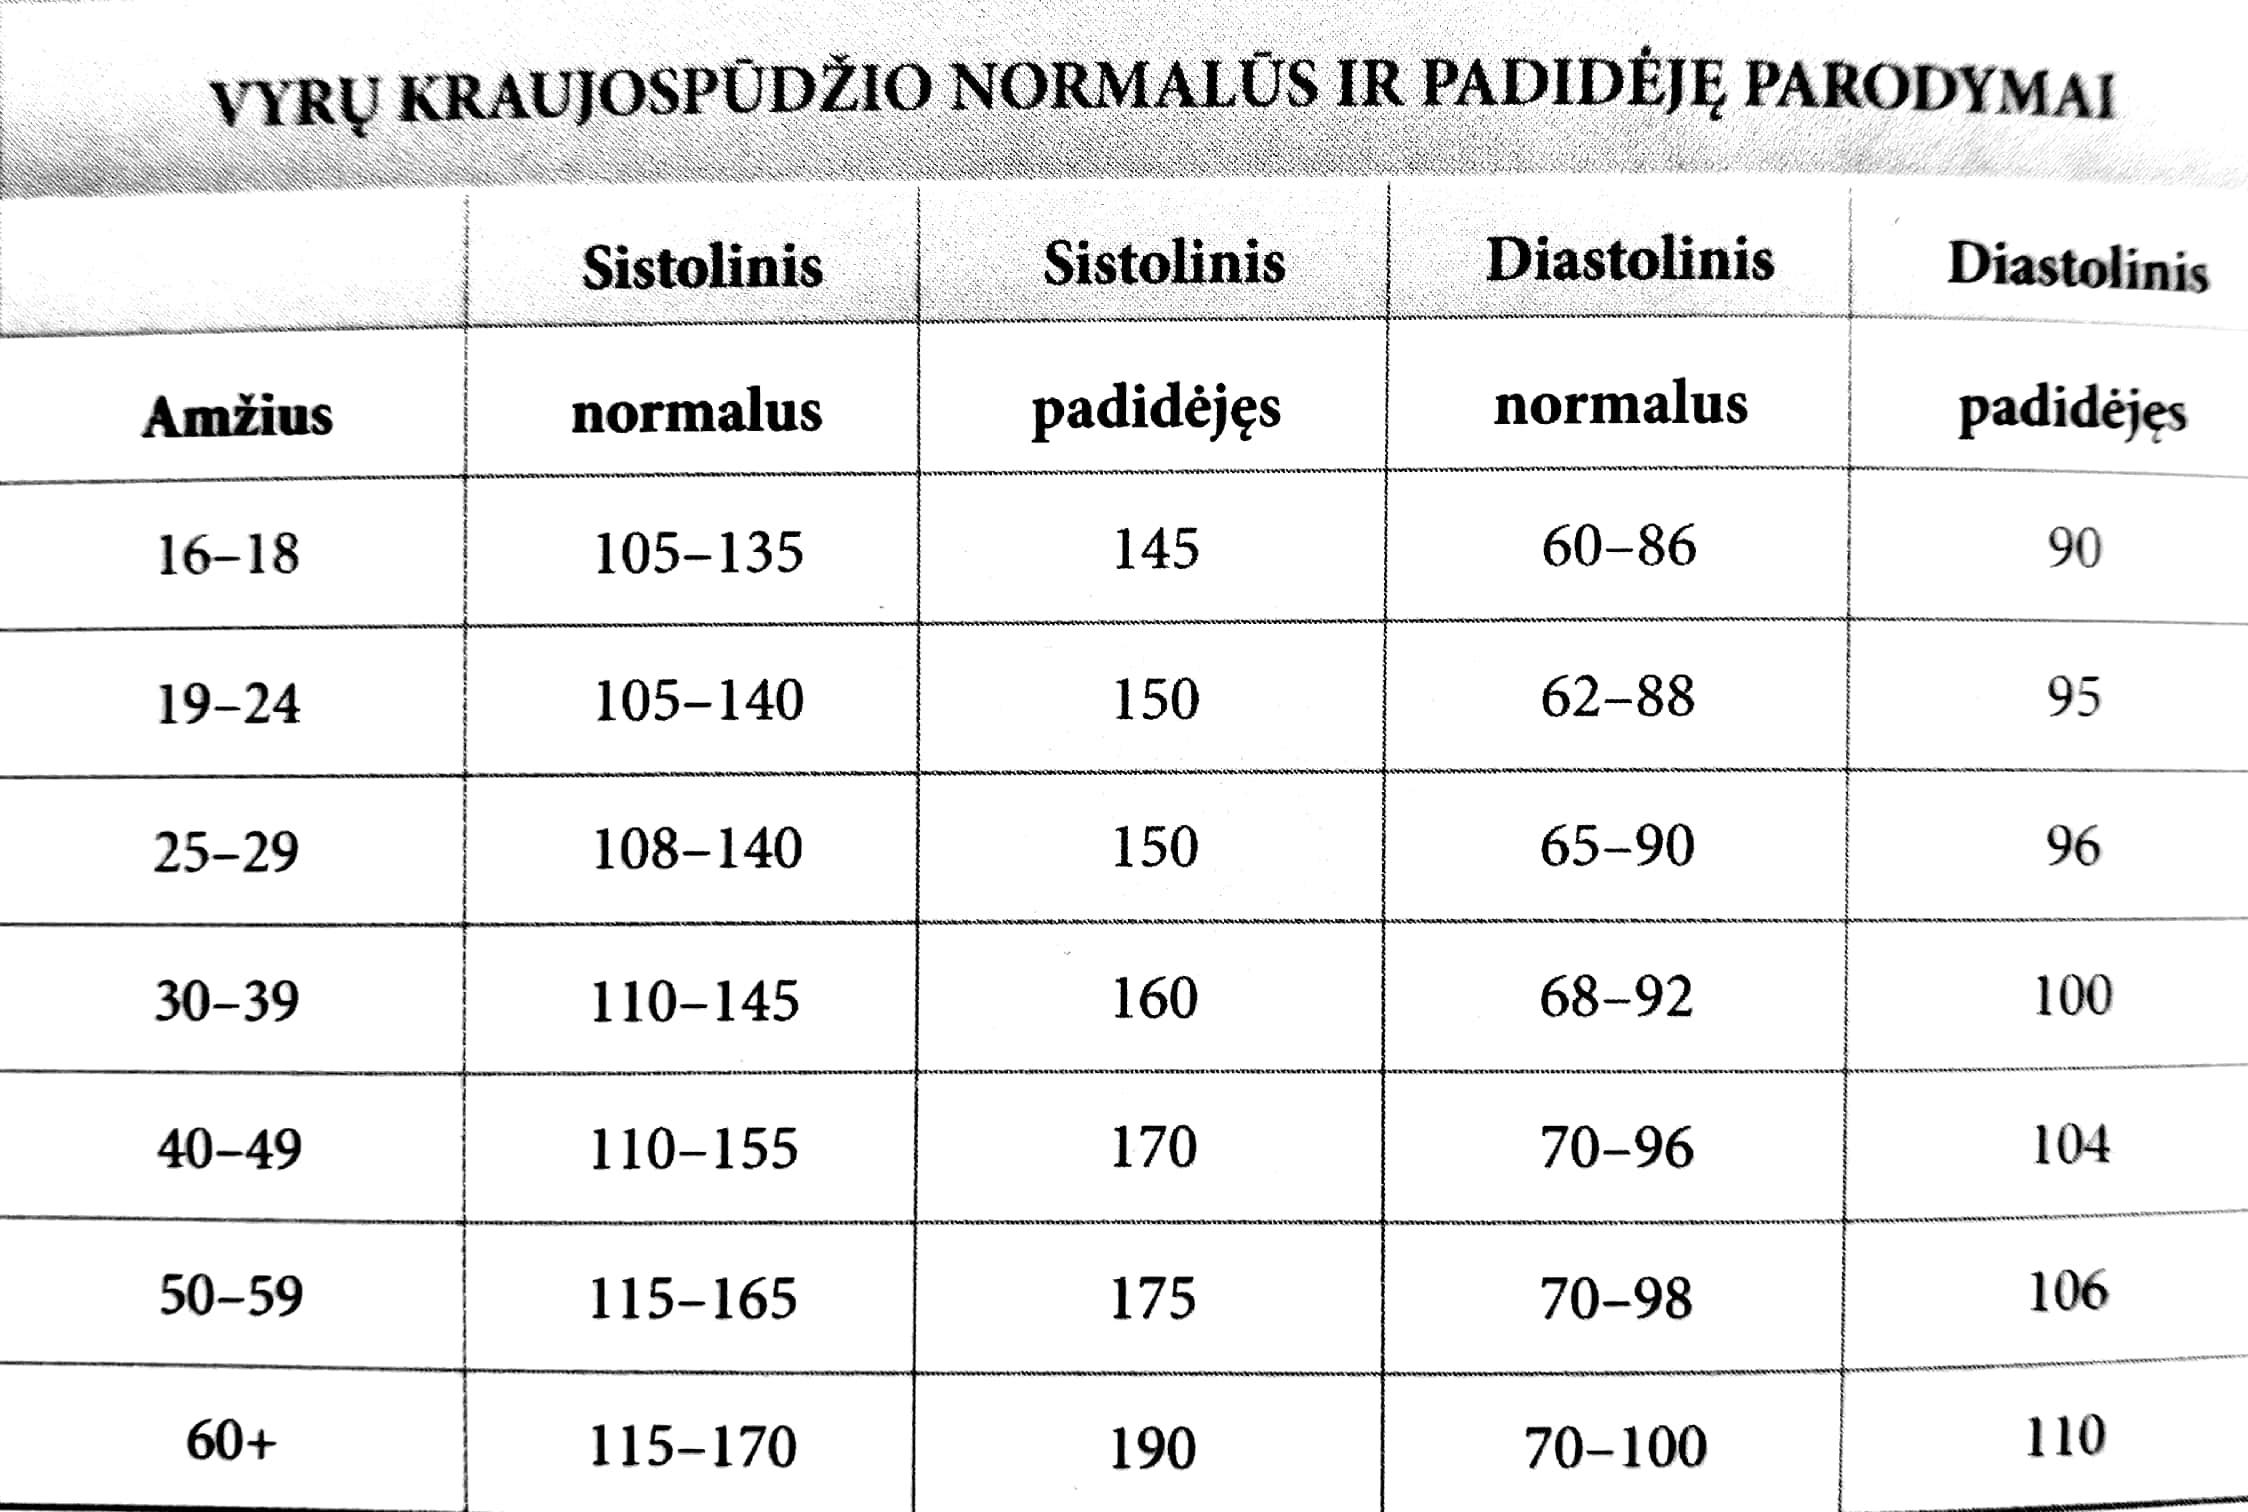 sergant hipertenzija, galite sportuoti)